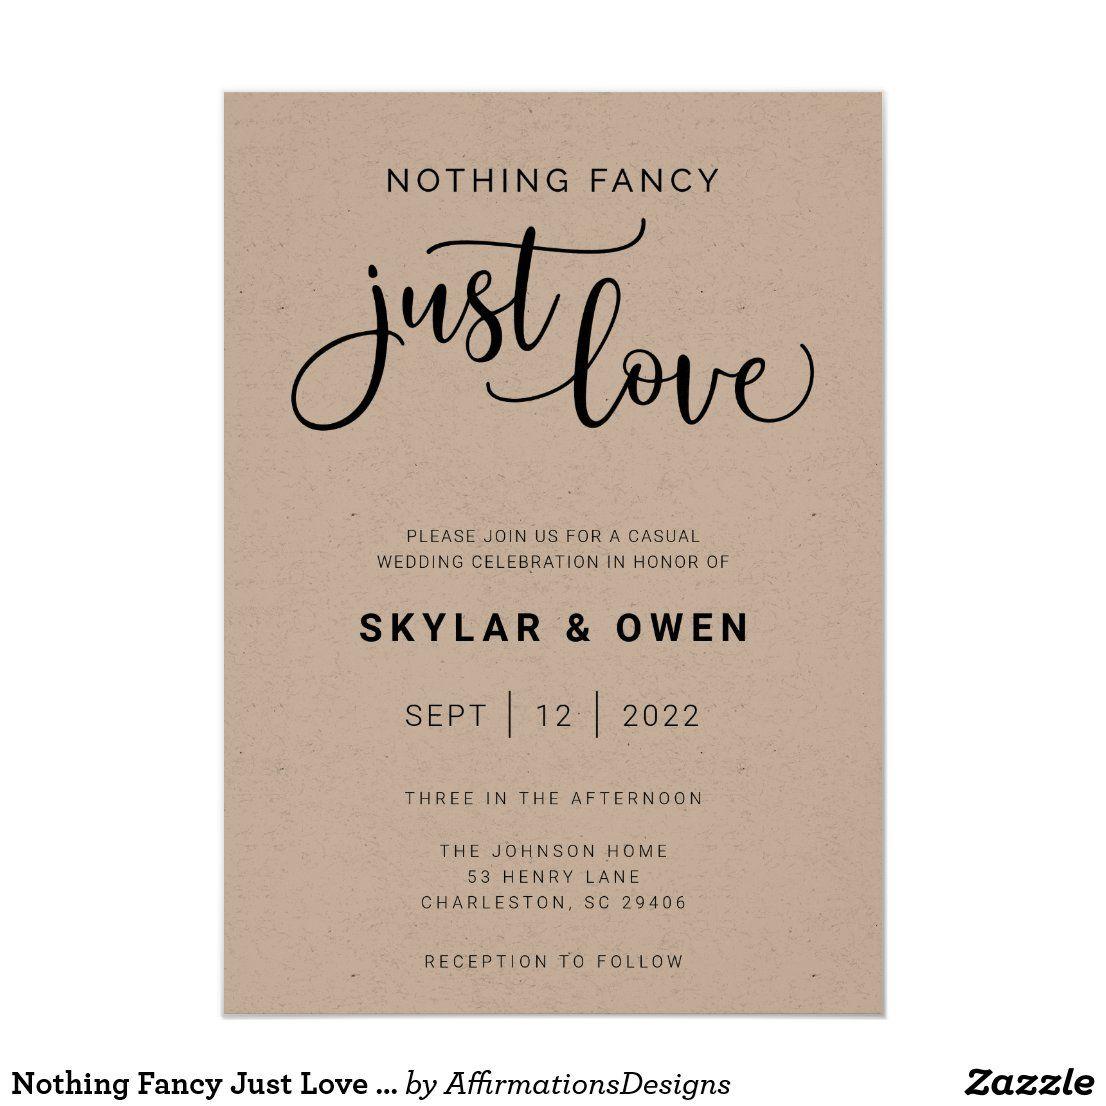 Nothing Fancy Just Love Wedding Invitation Zazzle Com In 2021 Second Wedding Invitations Unique Wedding Invitation Wording Wedding Invitation Quotes